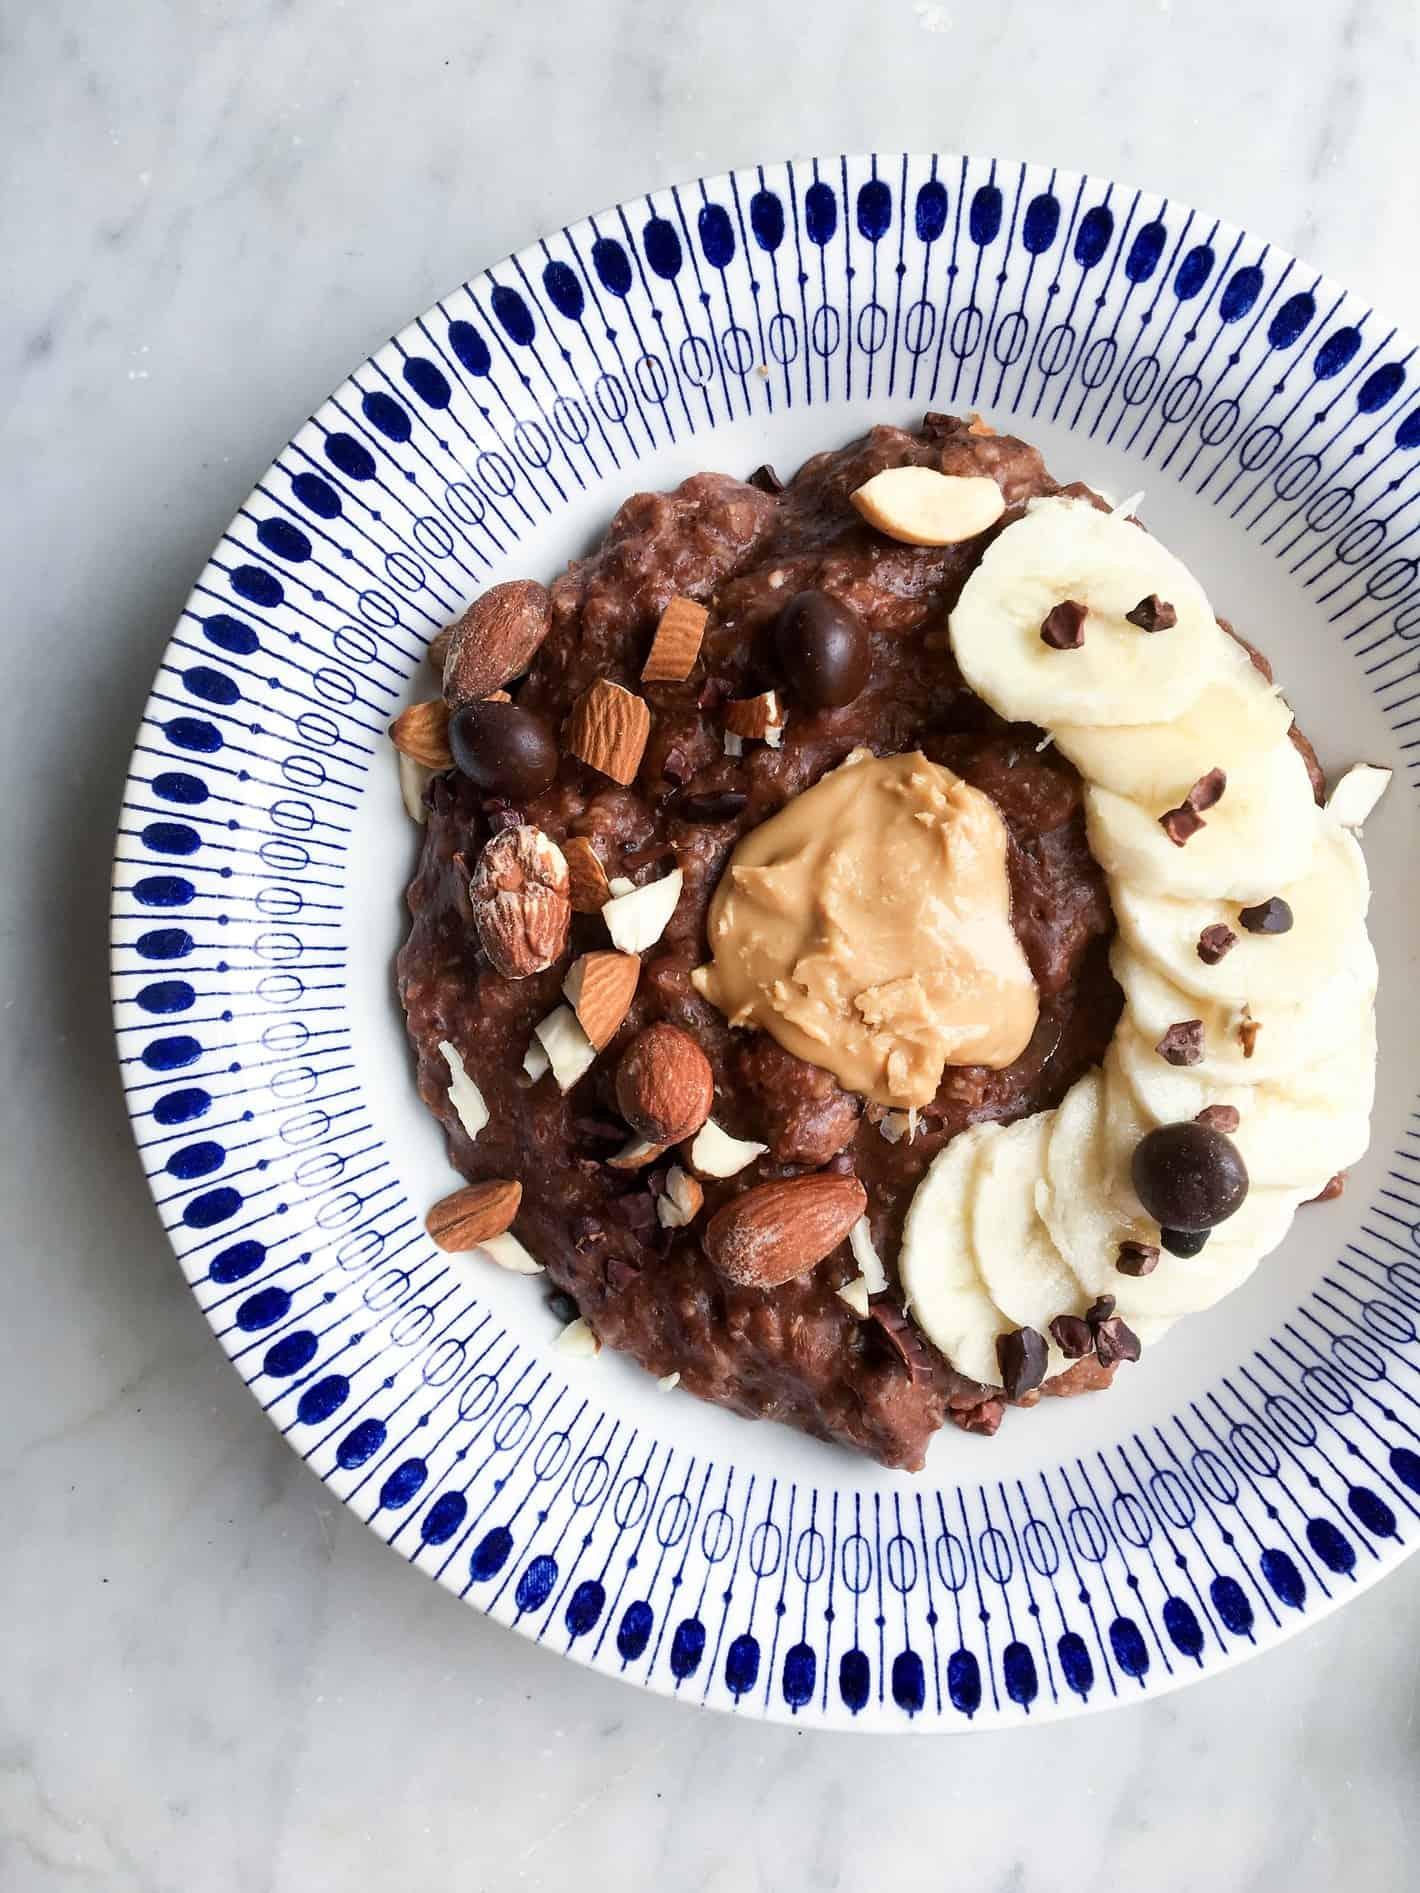 Chokoladegrød med chokolade og kakao